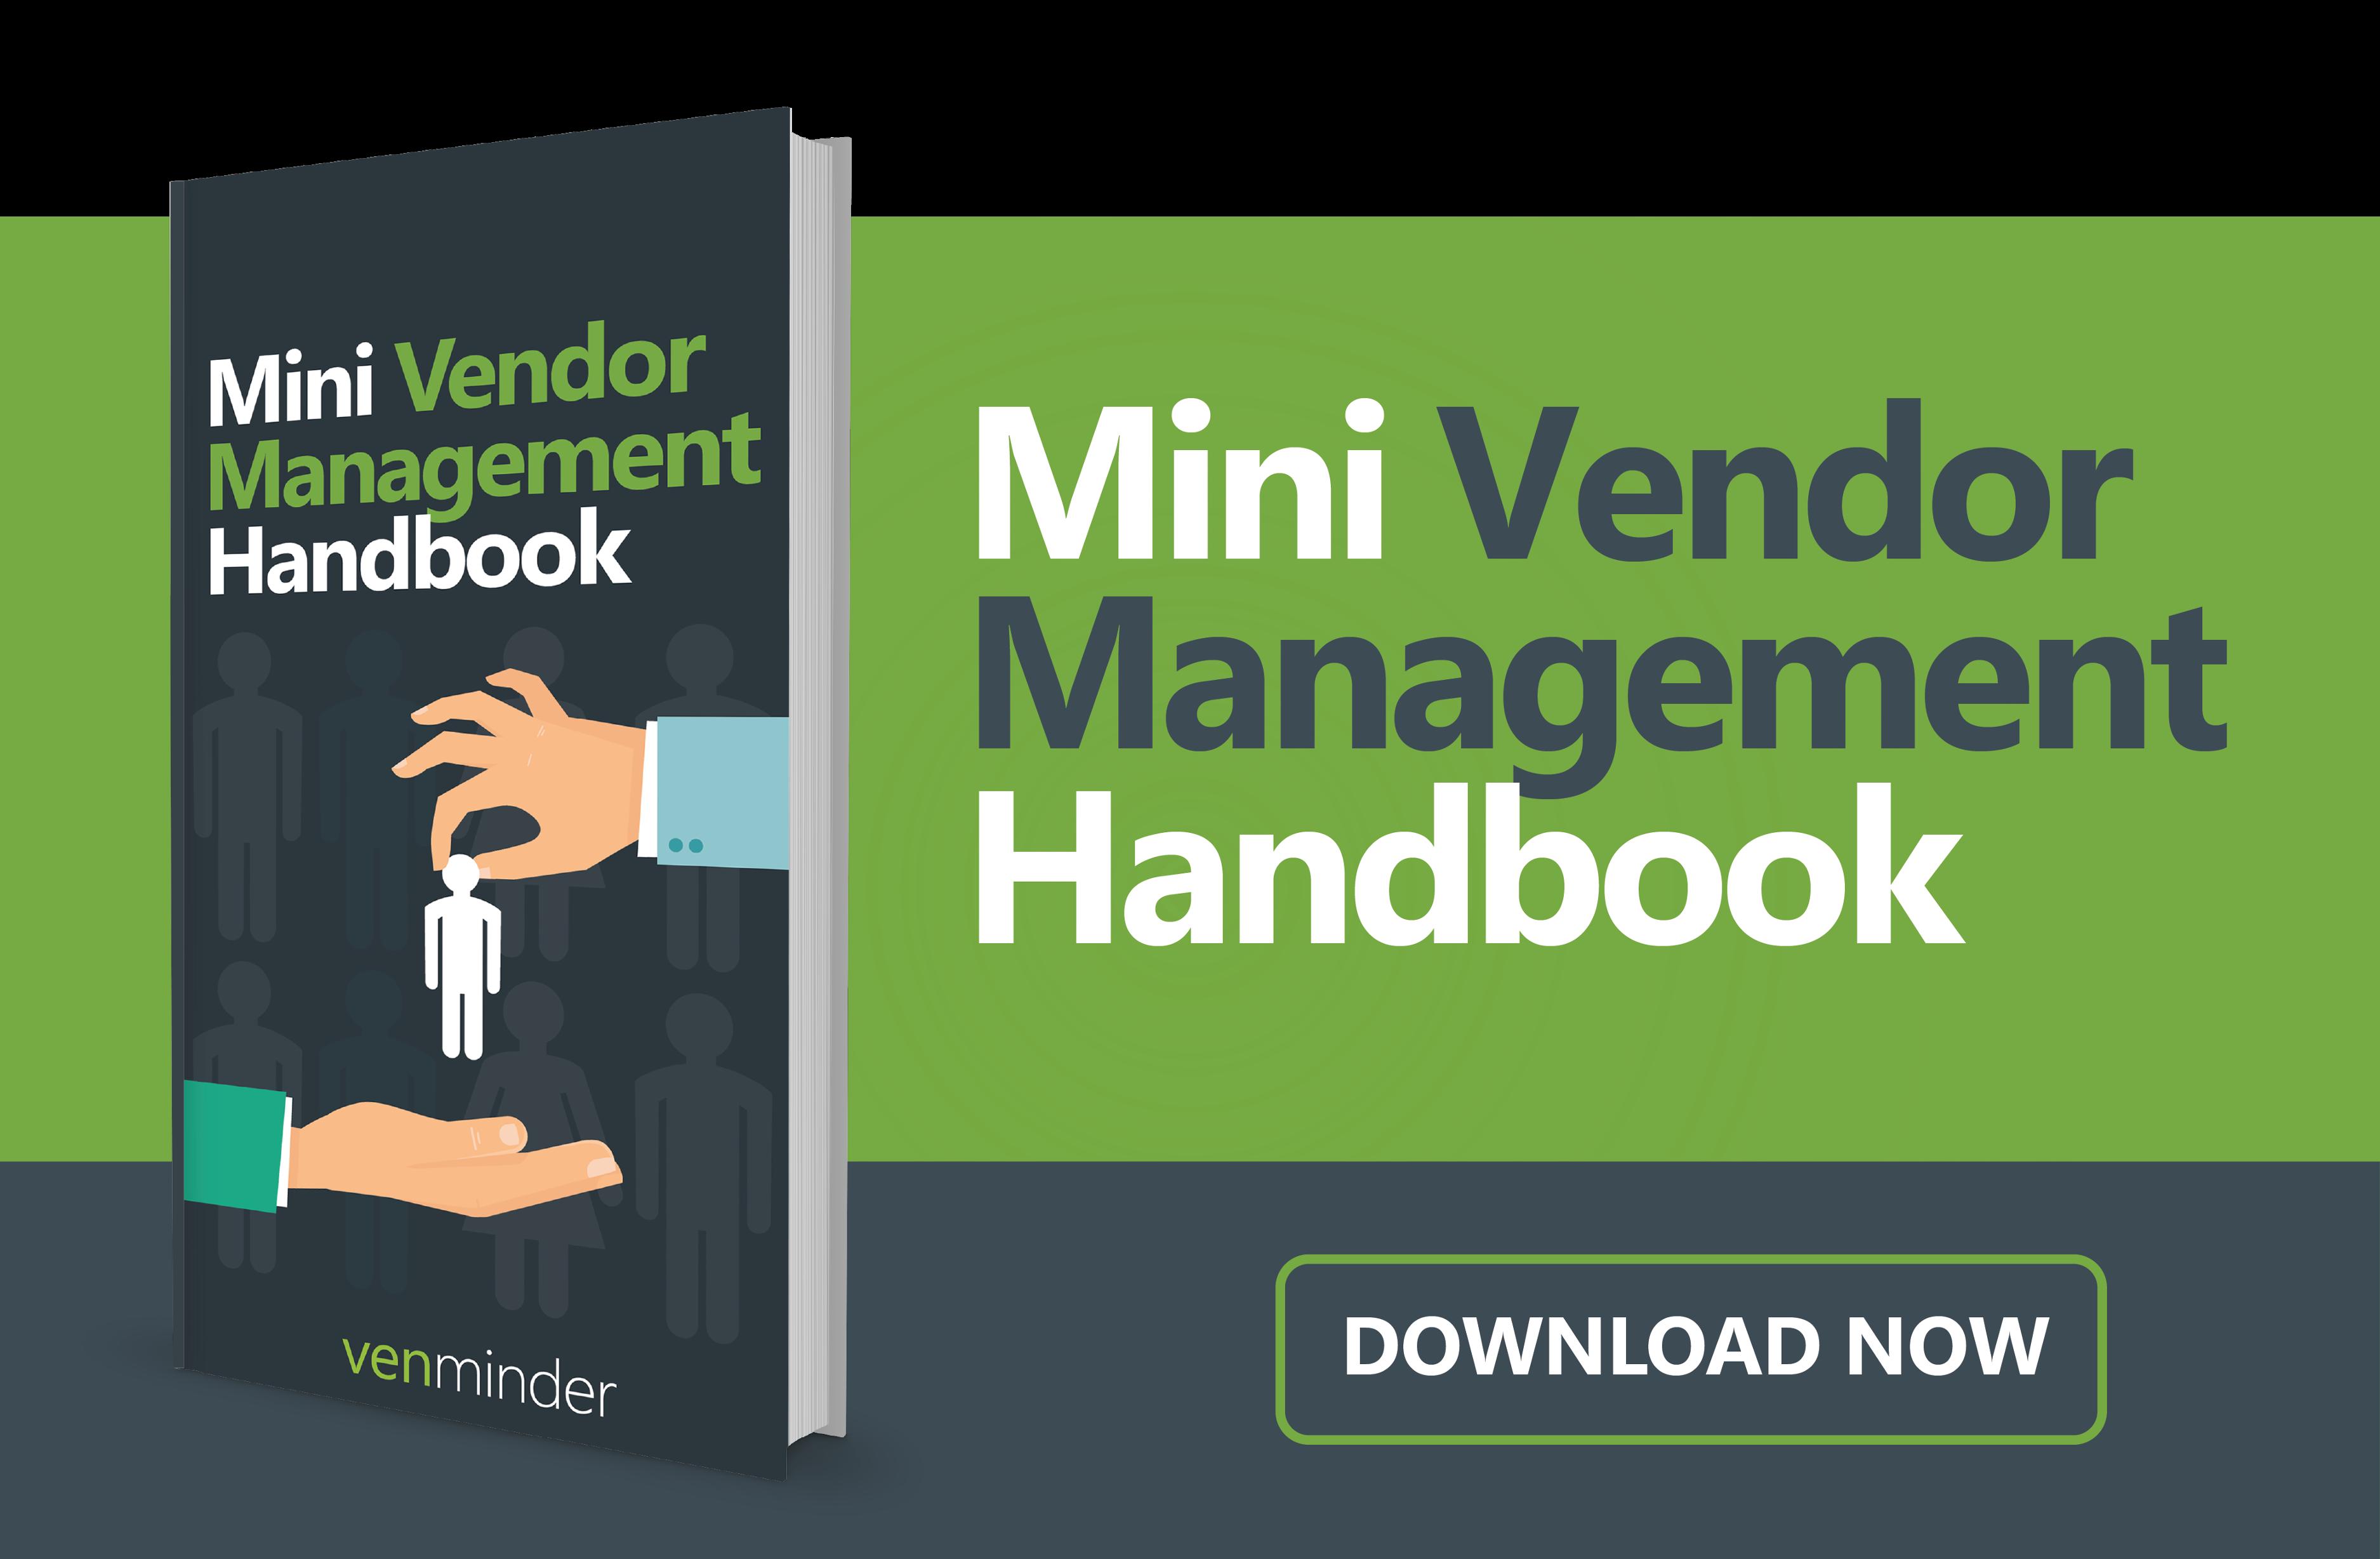 Mini Vendor Management Handbook